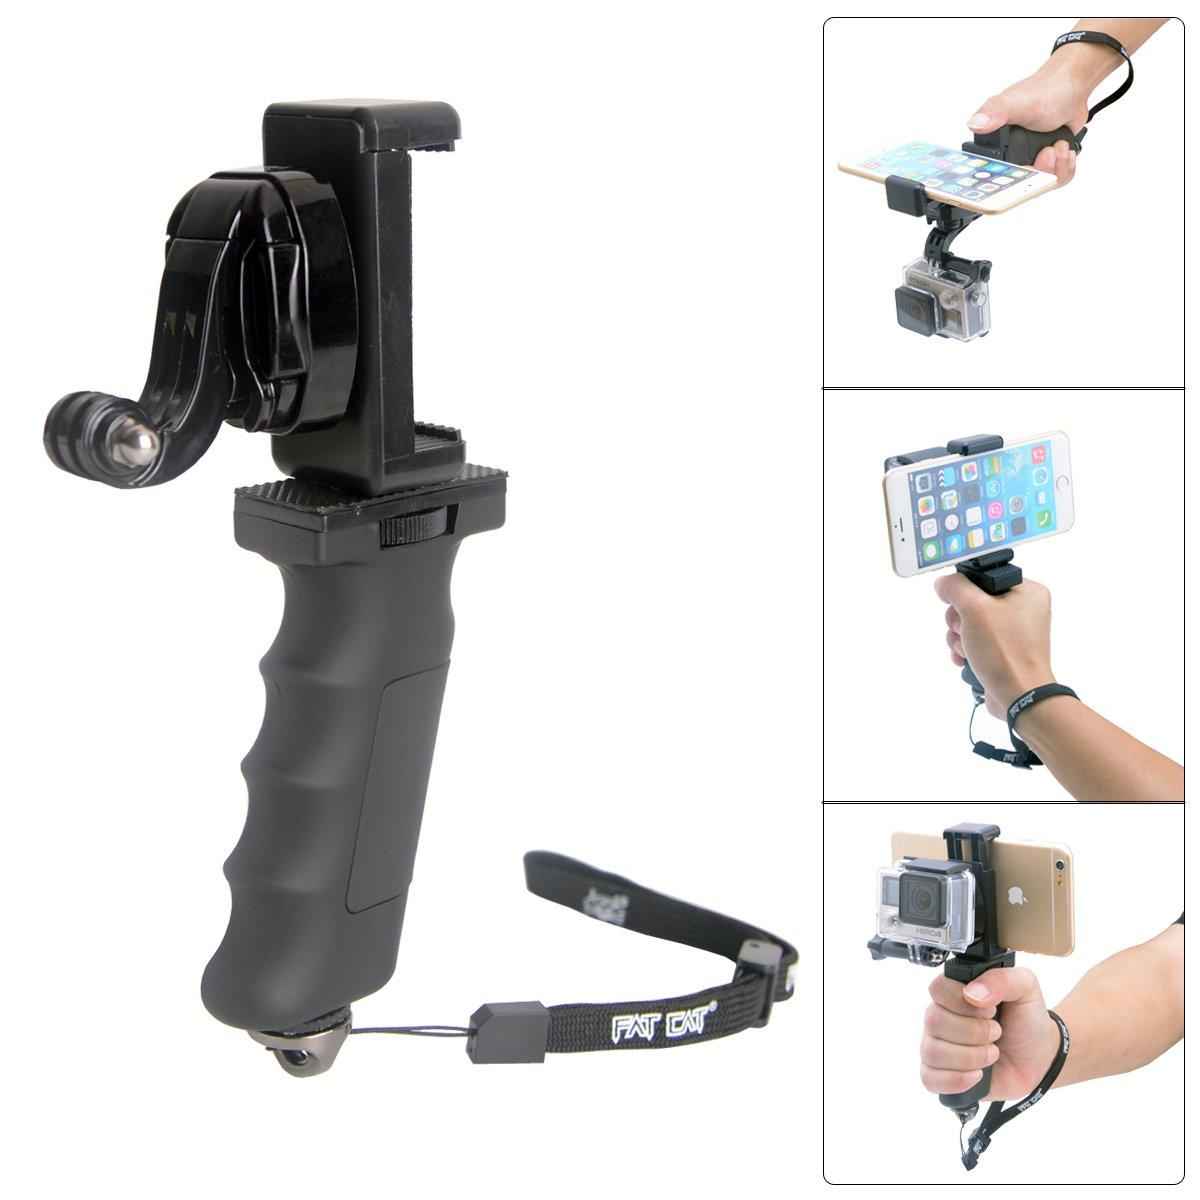 Ergonomic Action Camera Handle Grip Support w/ Smartphone Clip for GoPro Grip Holder Support for GoPro Hero 5 /4/3/Session Garmin Virb XE Xiaomi Yi SJCAM Hand Grip Mount Selfie Stick